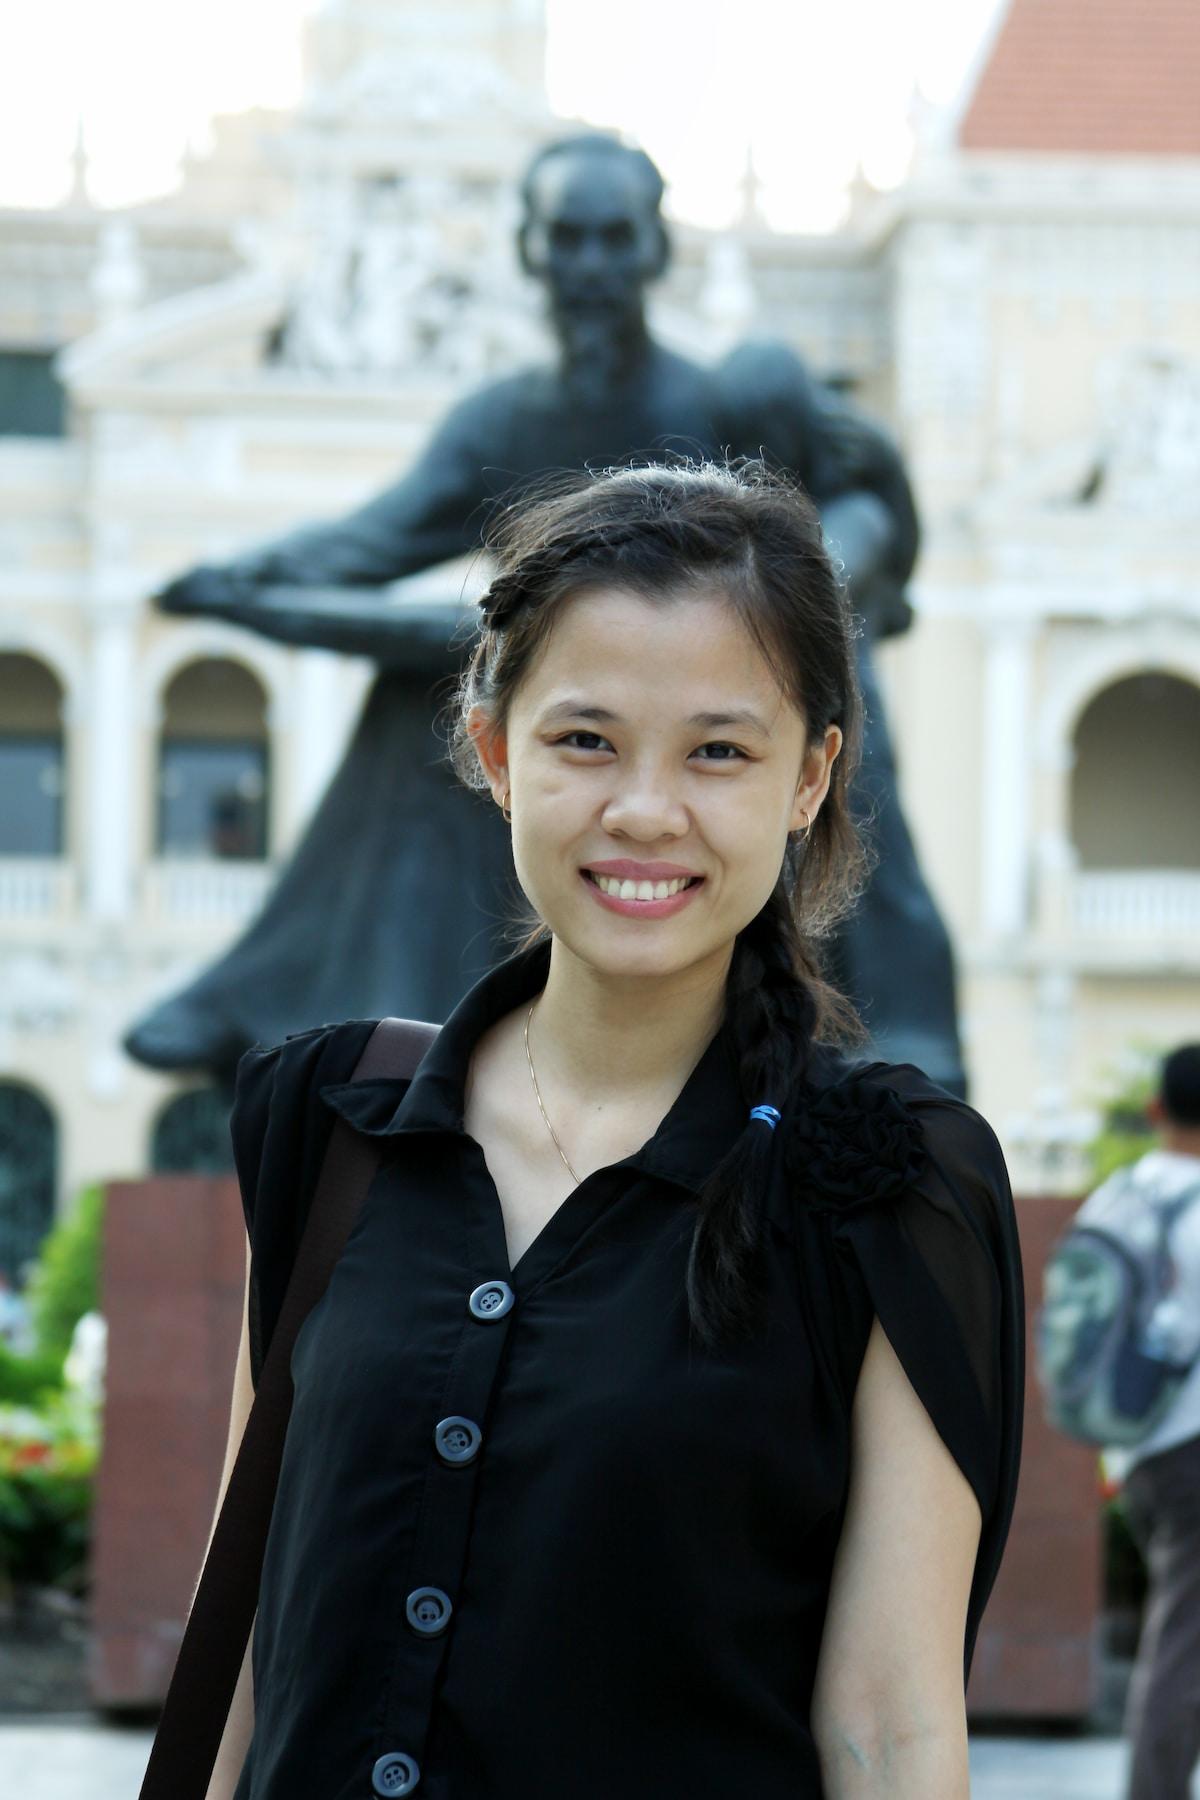 Le From Ho Chi Minh City, Vietnam